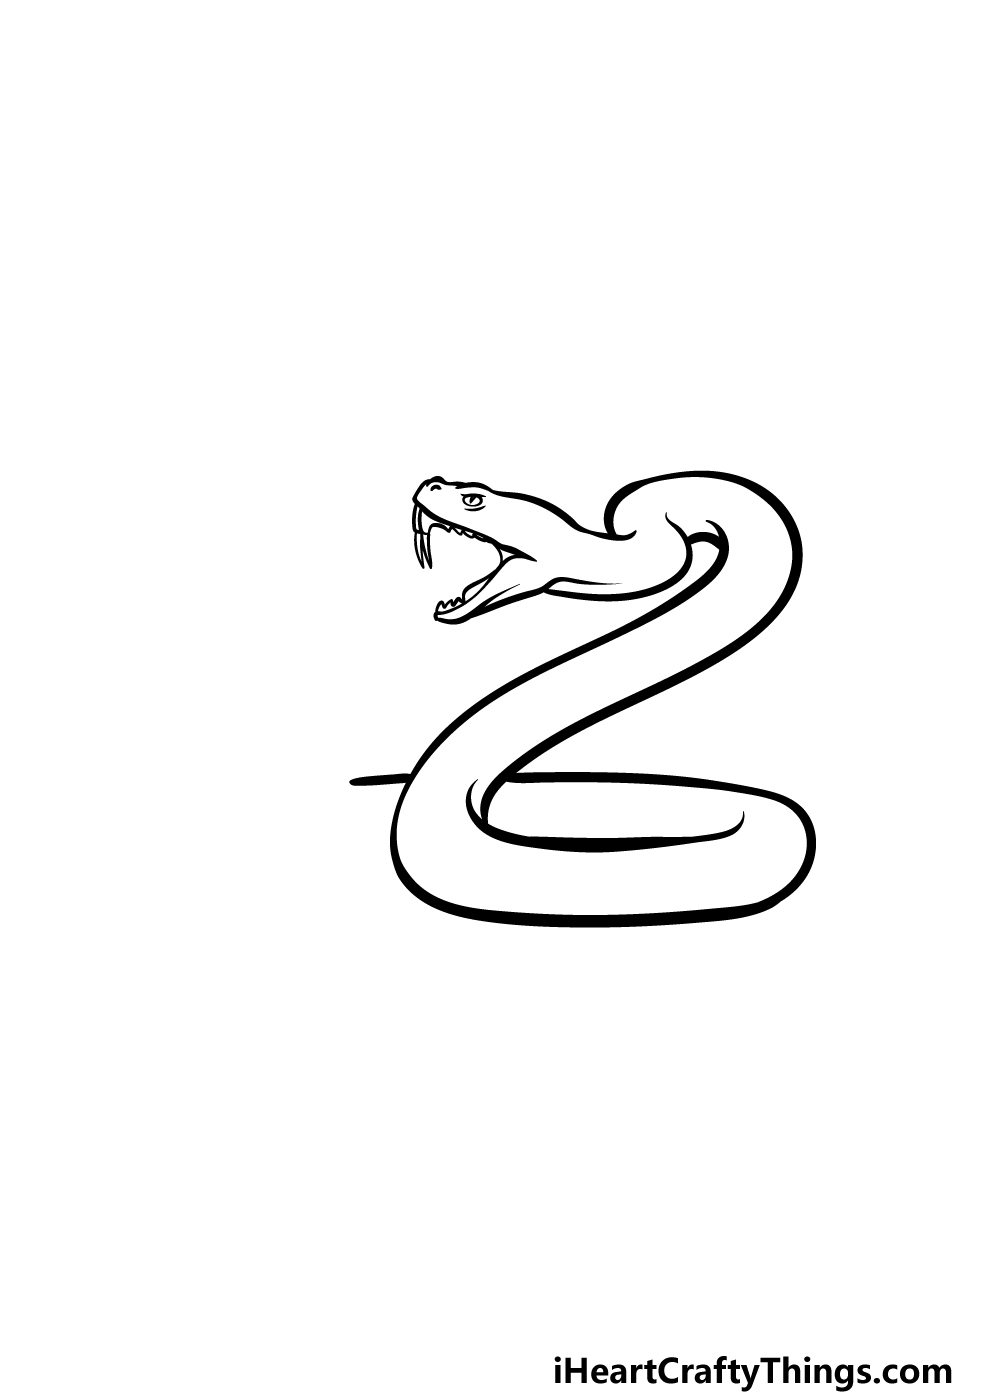 drawing a rattlesnake step 3